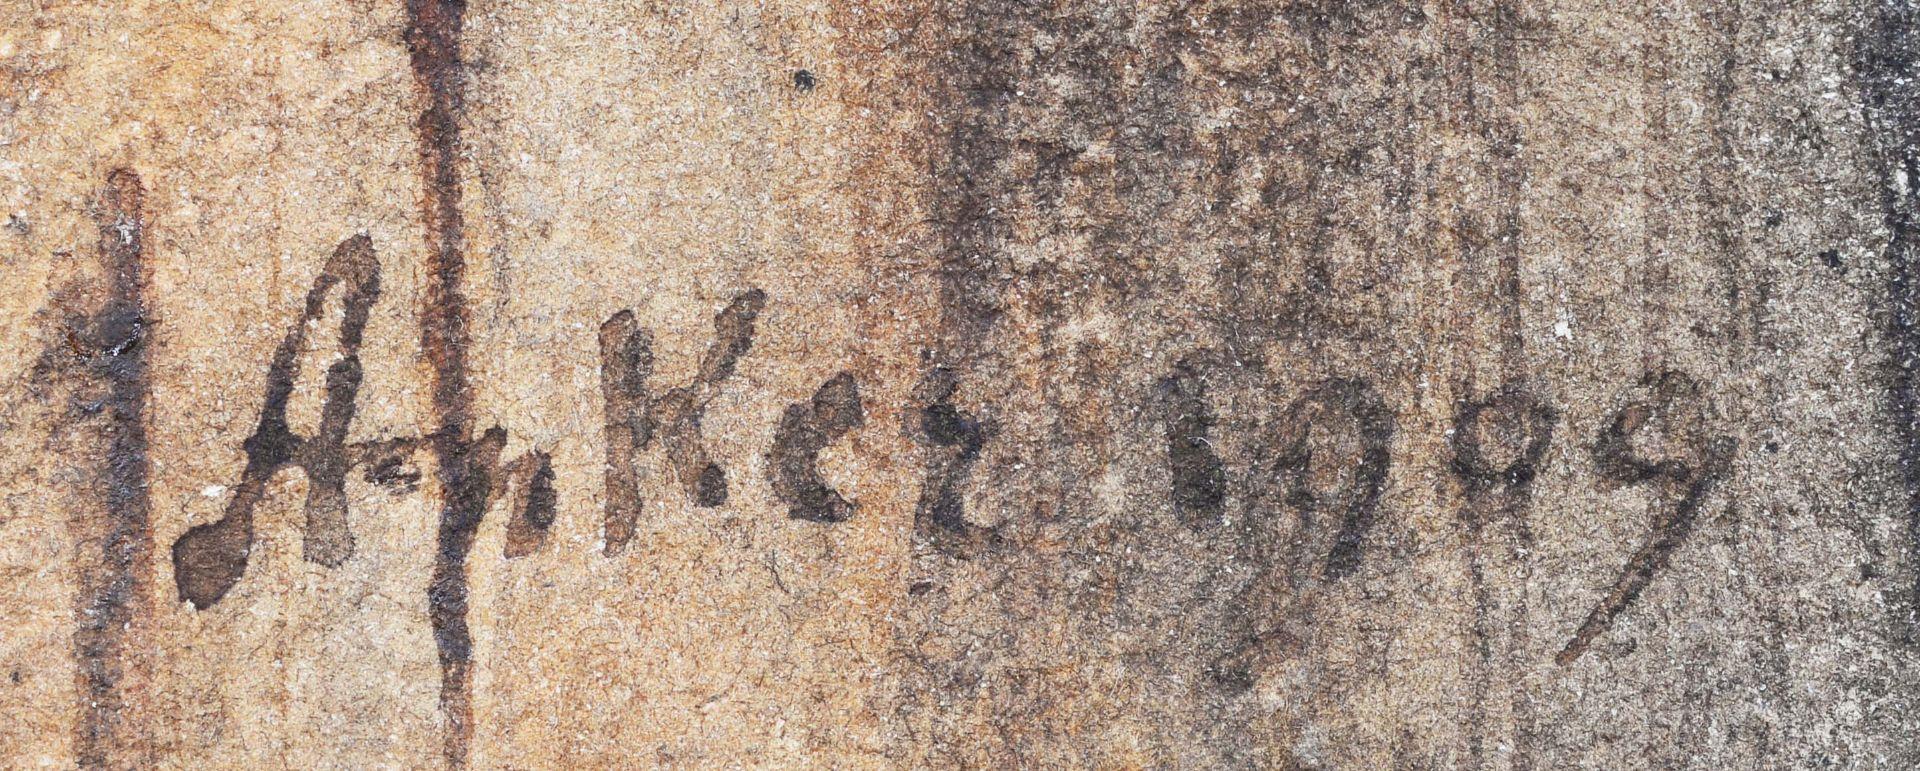 ANKER, ALBERT: Der Organist. - Image 4 of 6